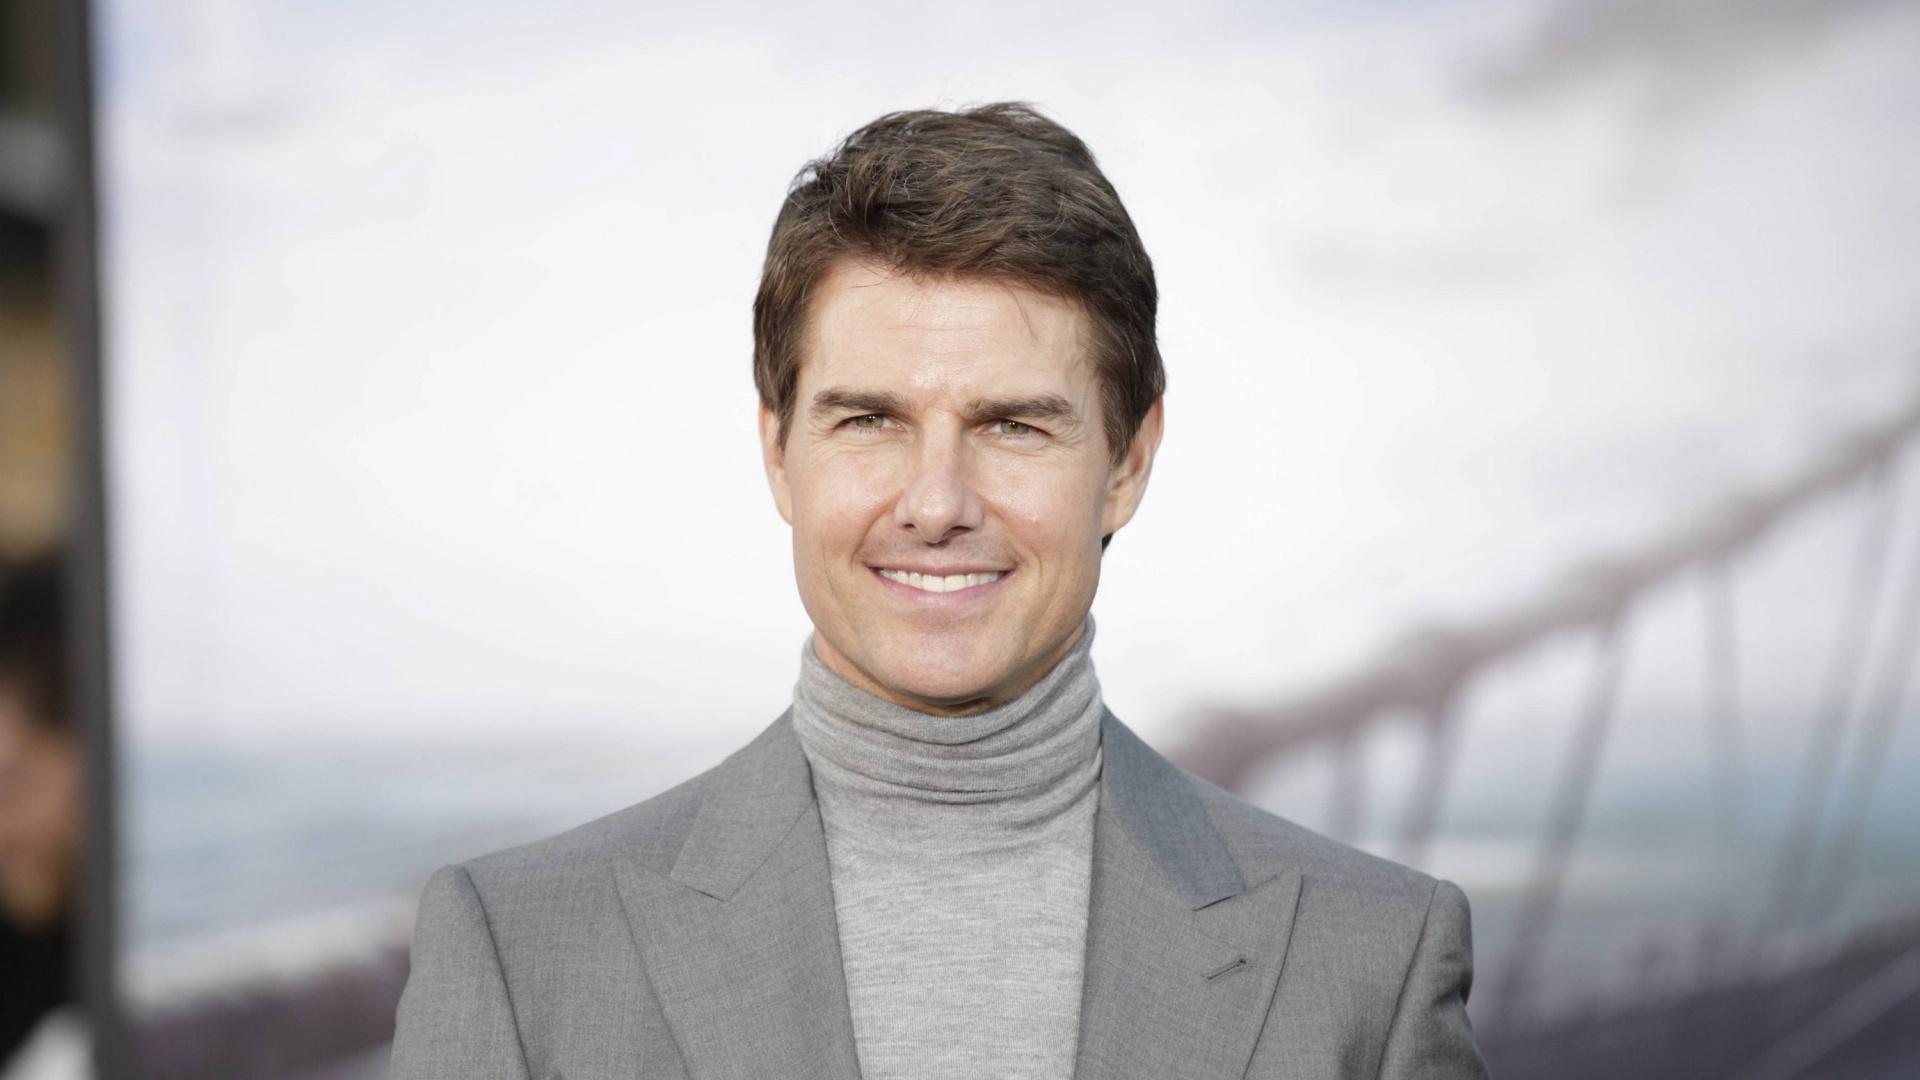 Celebrity Smile Tom Cruise Wallpaper 1920x1080 Wallpaper Teahub Io